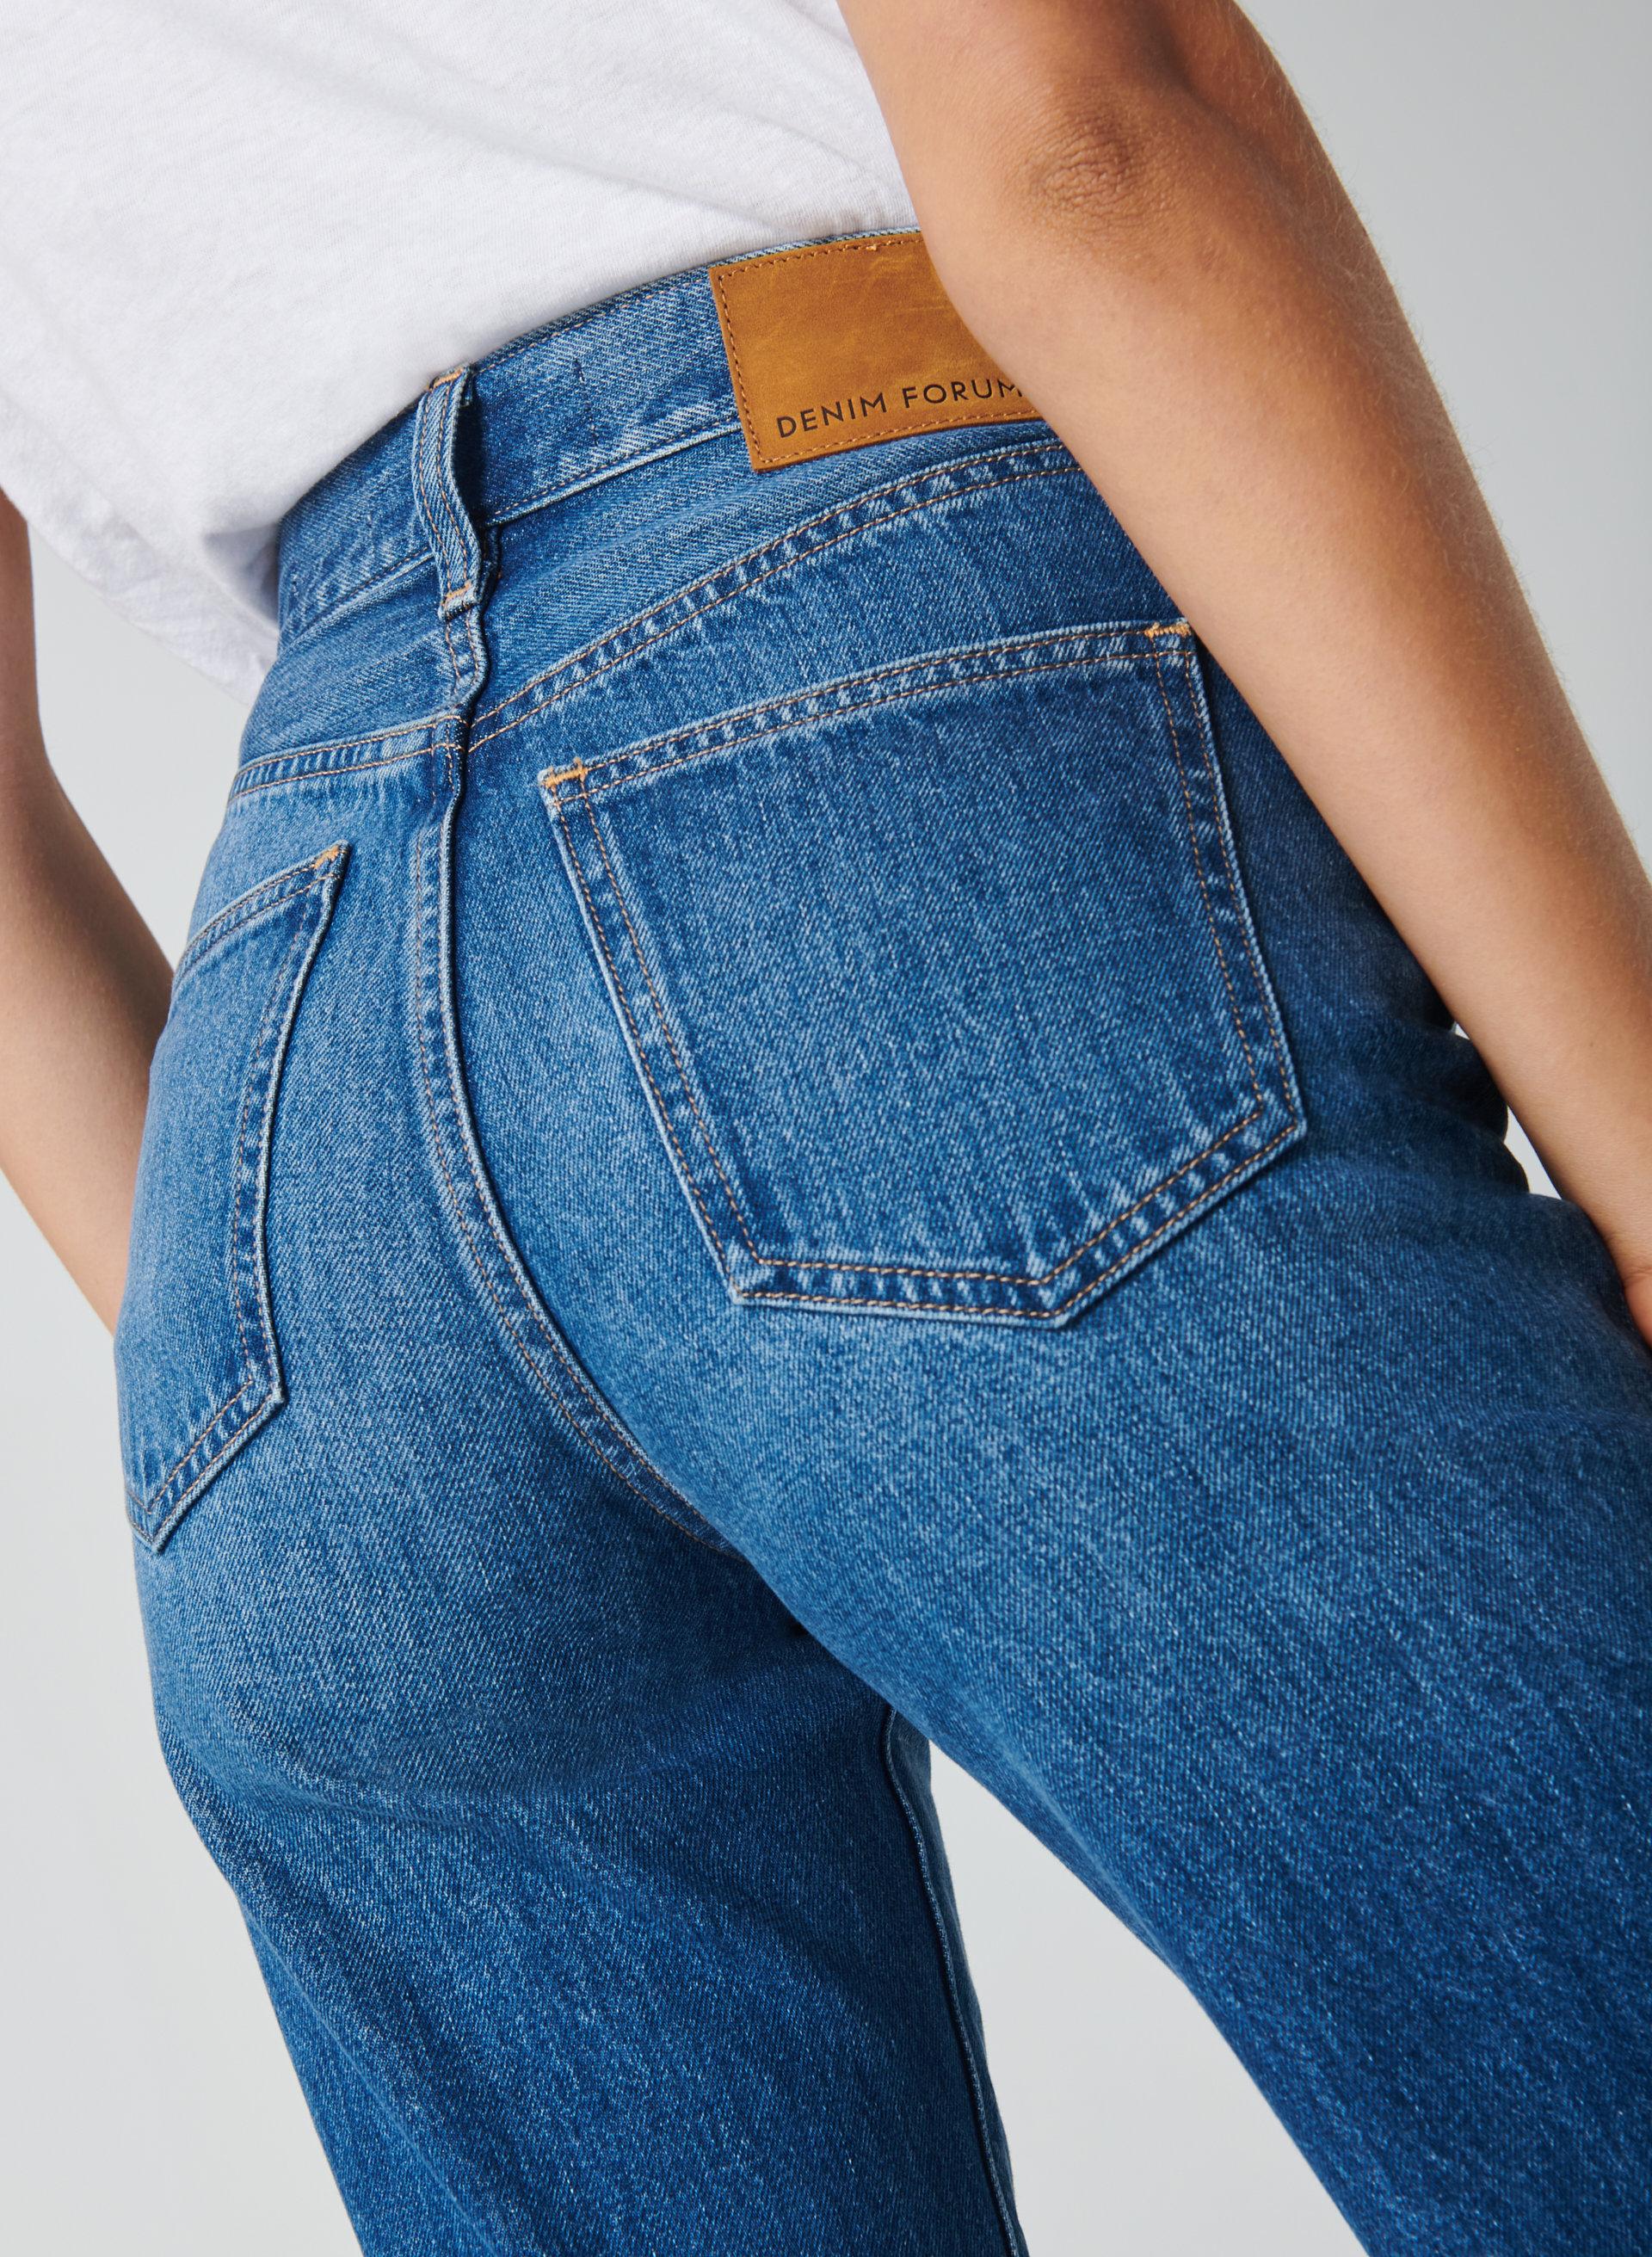 Farah Slim Jeans Taille 32 Jambe 30 BLEU MOYEN